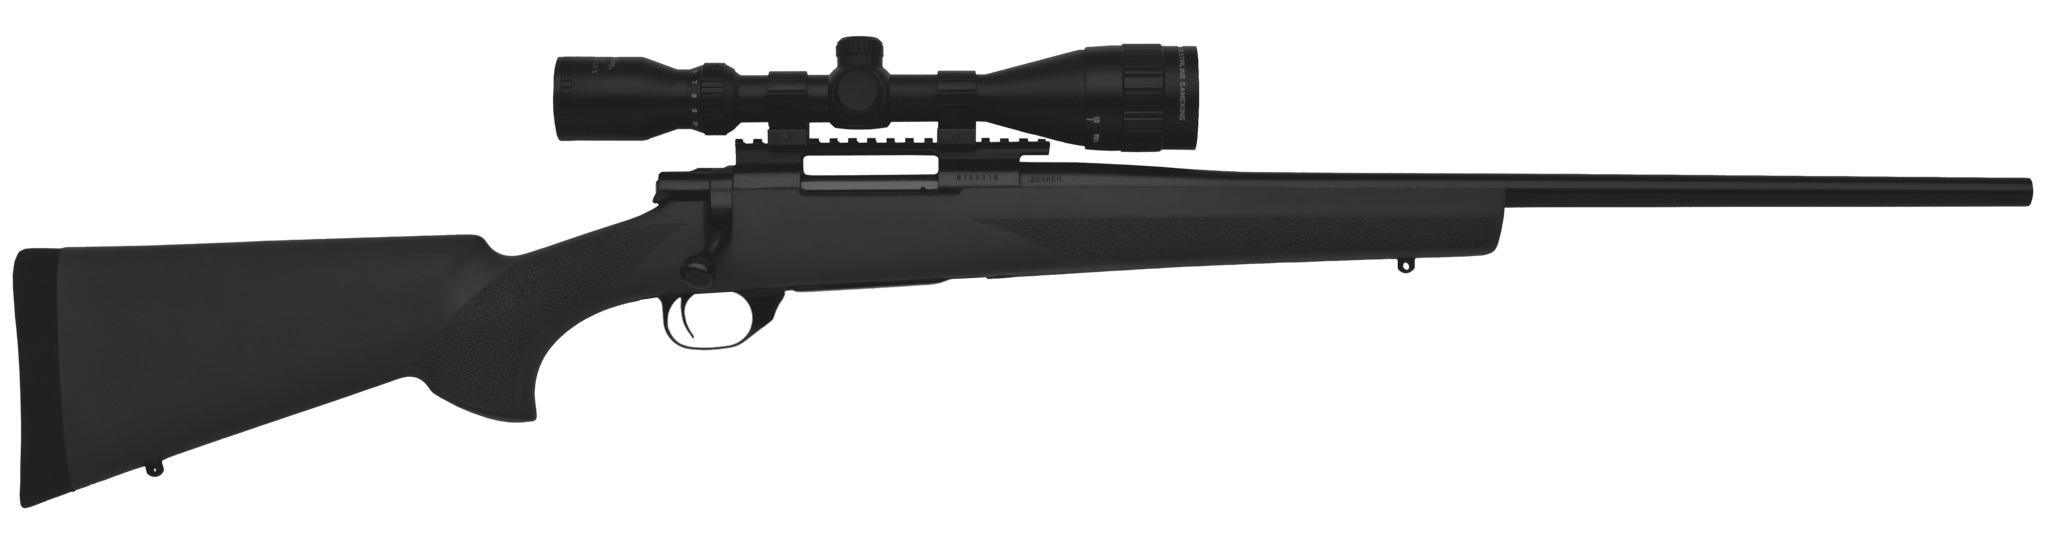 HOWA M1500 Gamepro 6.5 Creedmoor